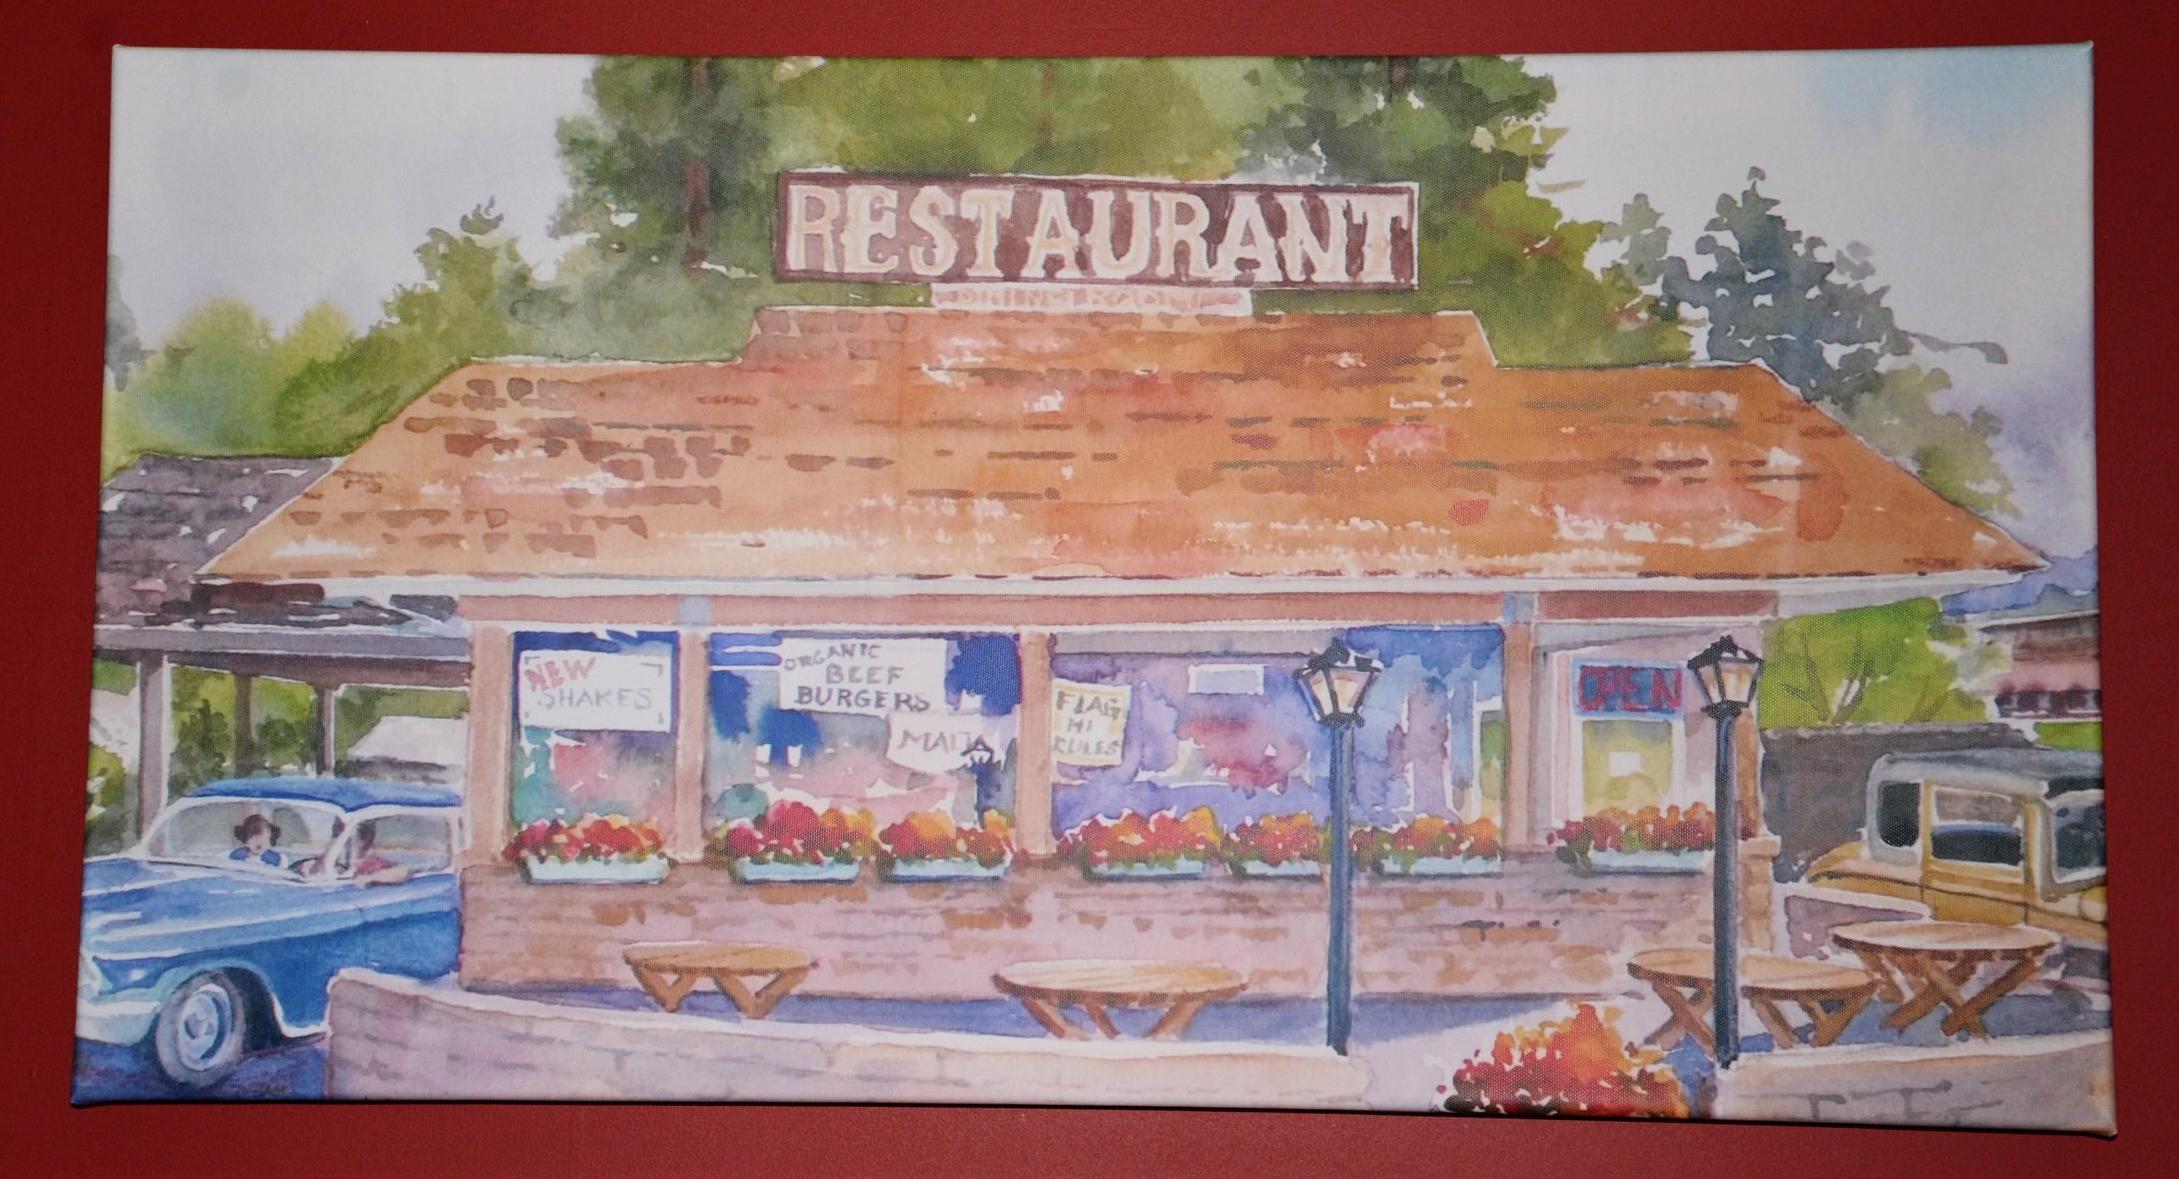 Mrs.Browns Burger Bar